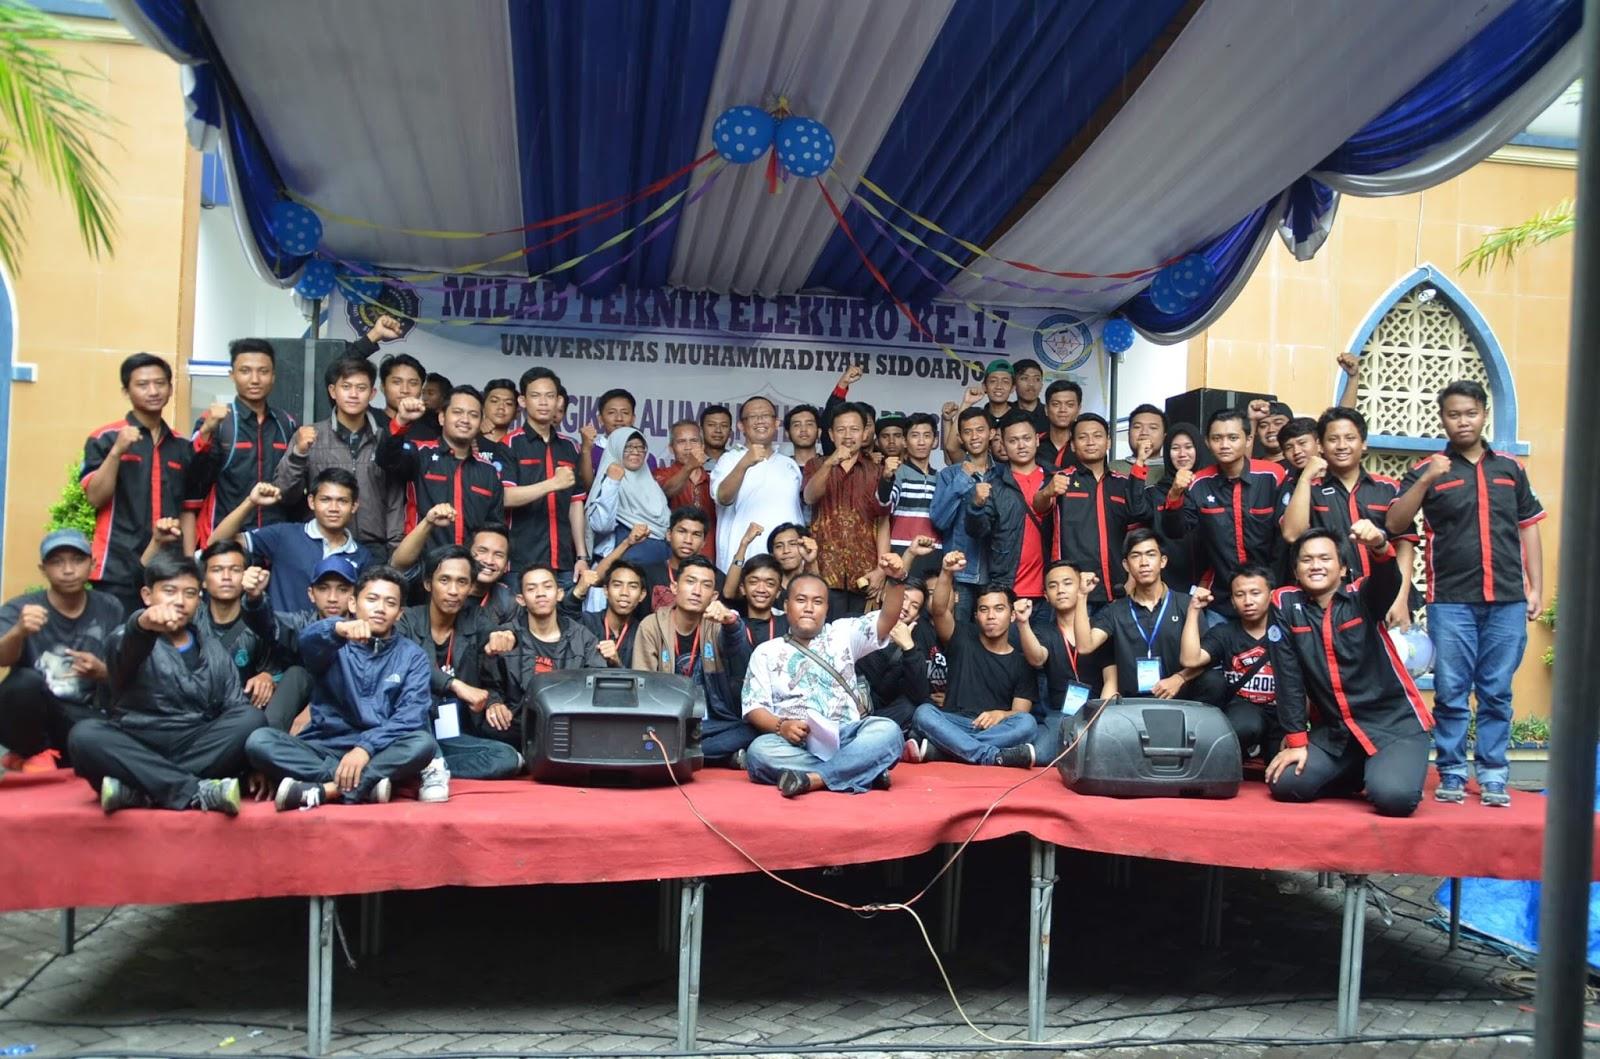 HIMANITRO UMSIDA, himpunan mahasiswa jurusan teknik elektro, hmj elektro, universitas muhammadiyah sidoarjo, umsida